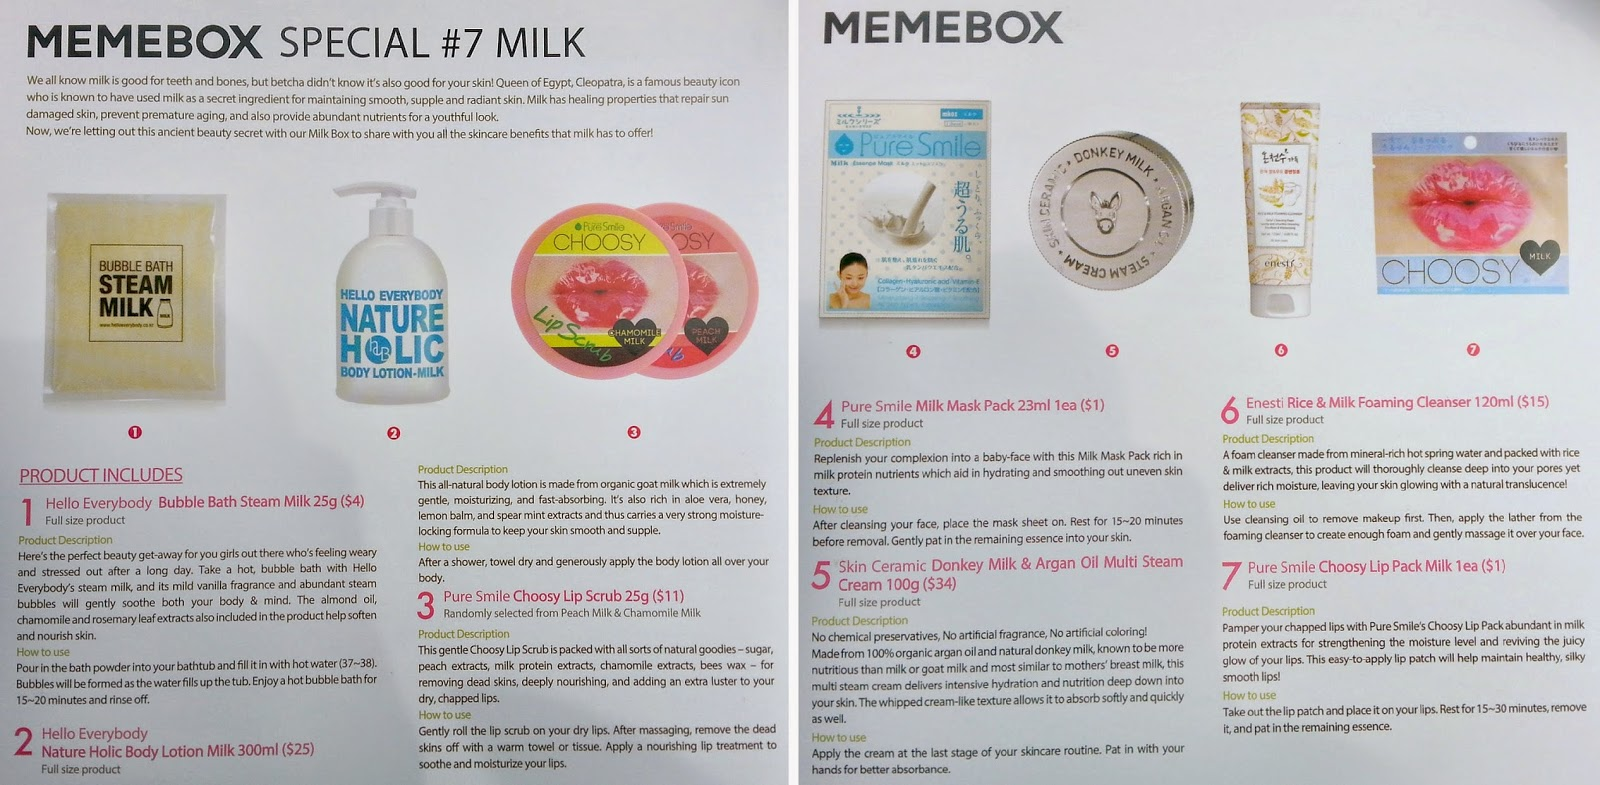 Memebox, Milk Skincare, Memebox Special #7 Milk